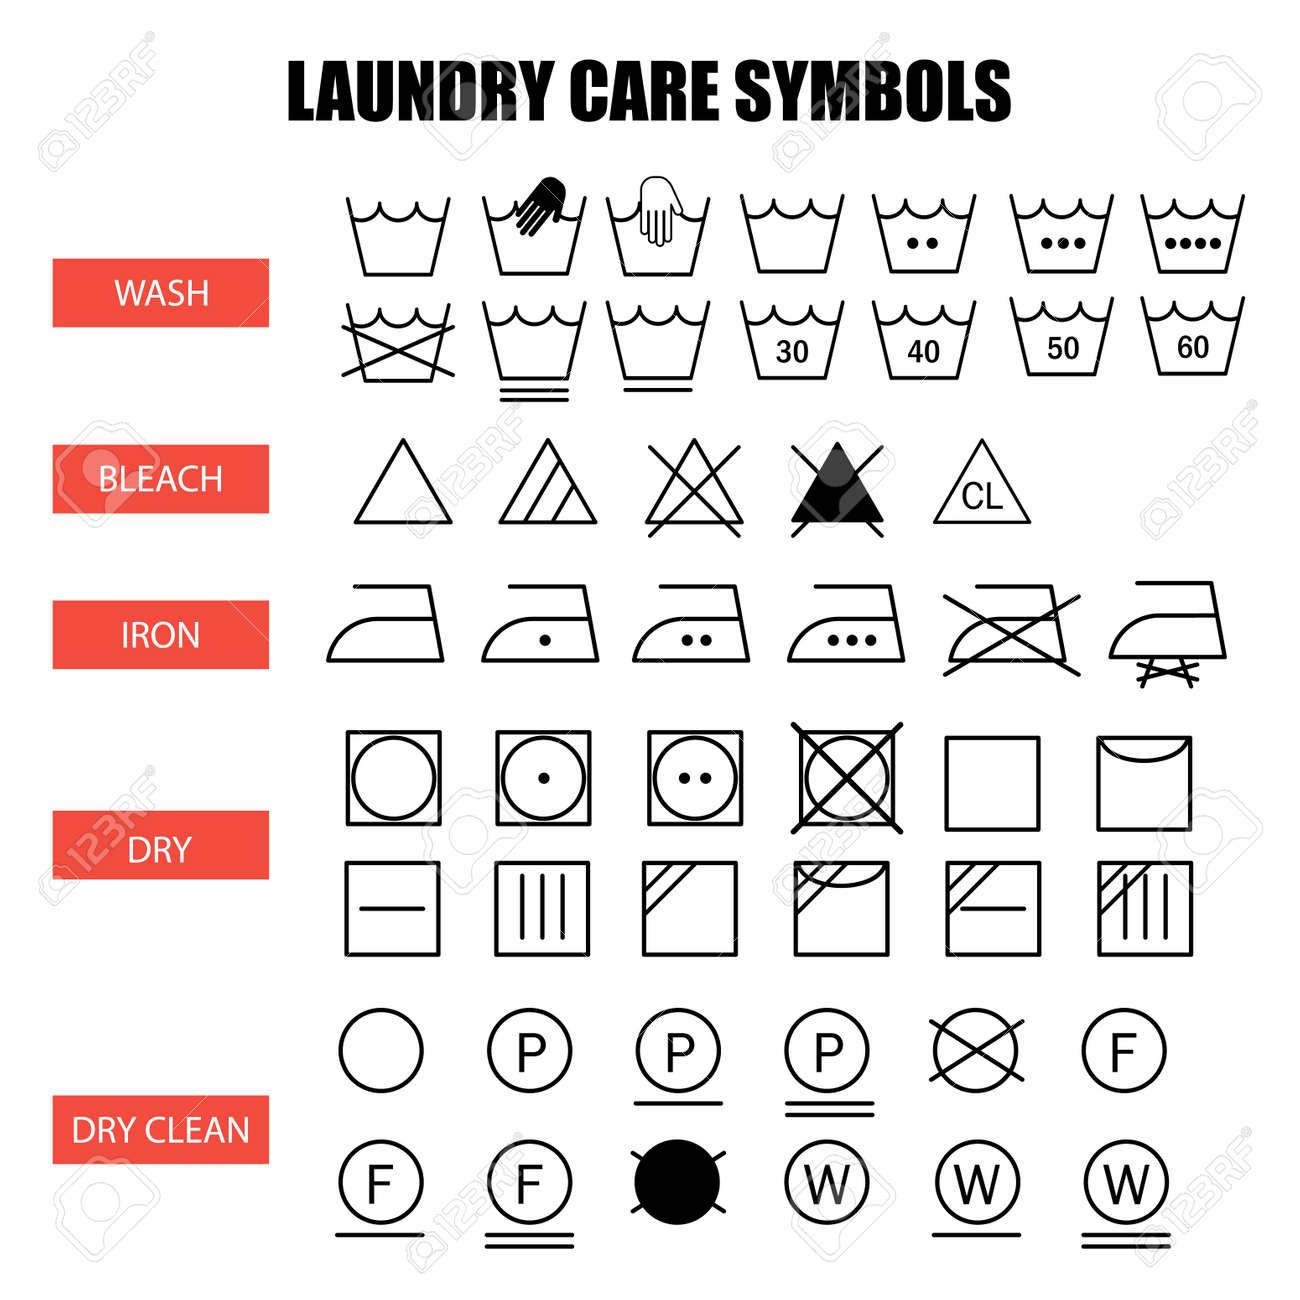 bleach symbol laundry